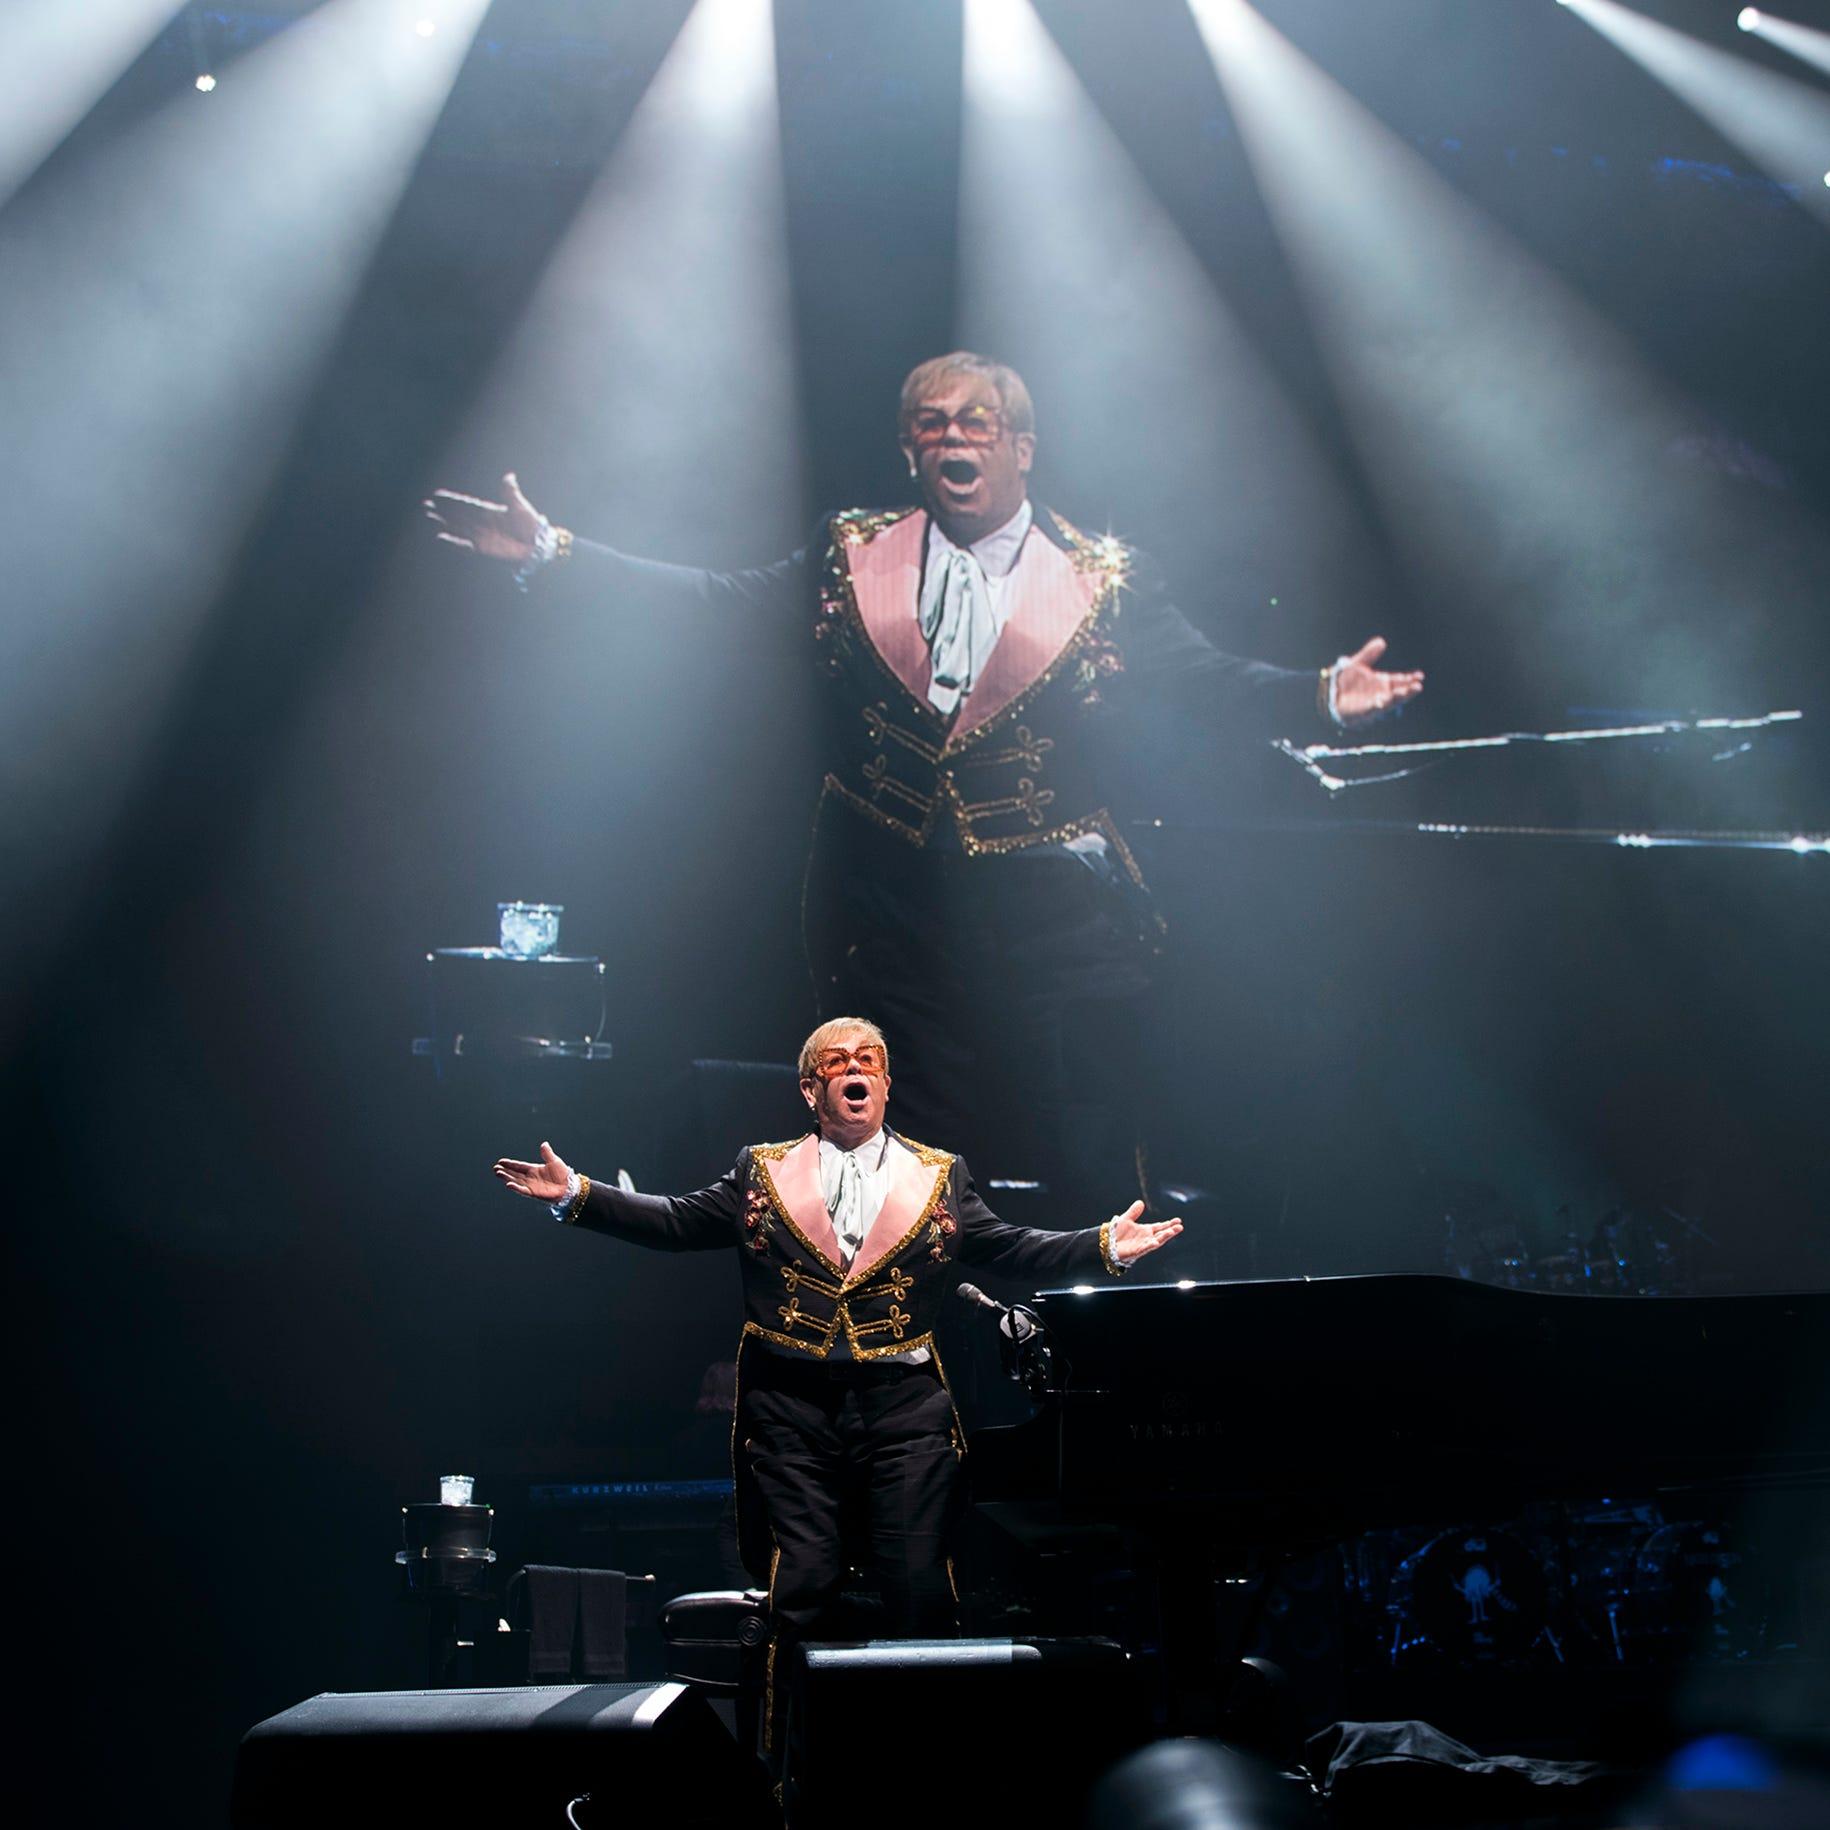 Elton John farewell tour setlist: 5 songs we want to hear at Farewell Yellow Brick Road